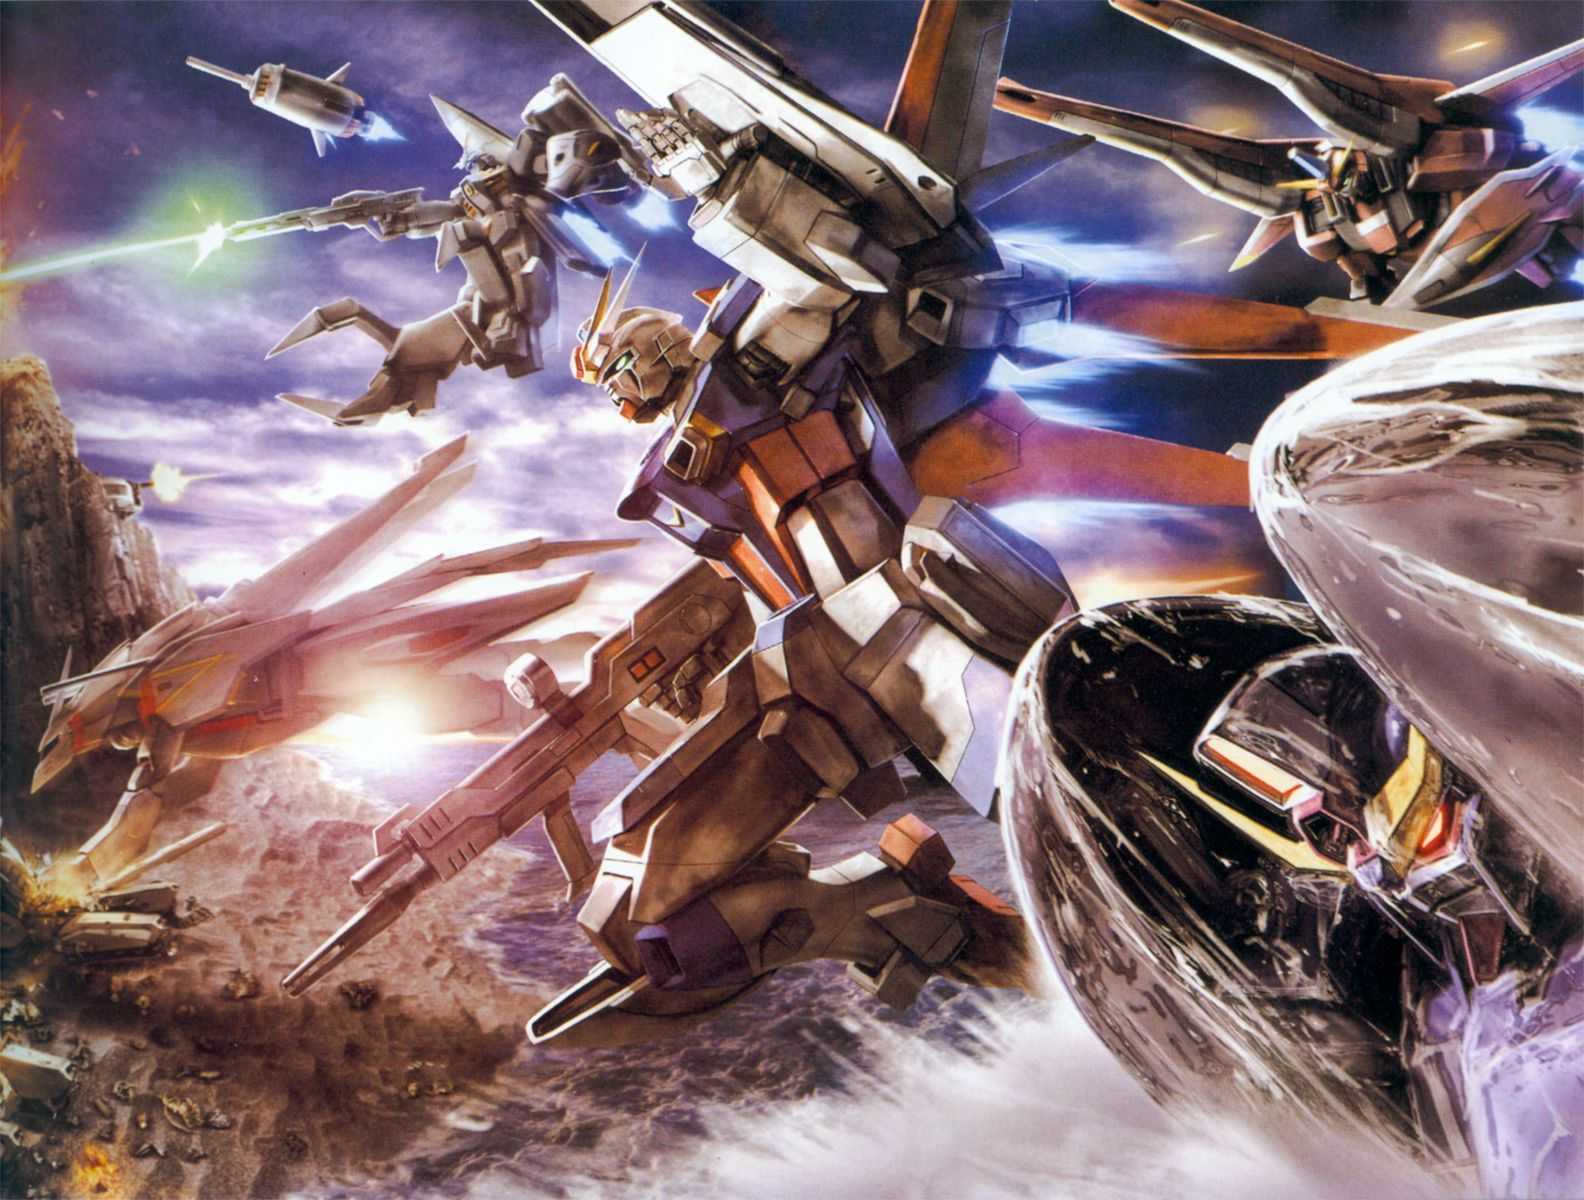 Gundam gundam seed wallpaper dcrvelimeons pinterest gundam gundam seed wallpaper voltagebd Images